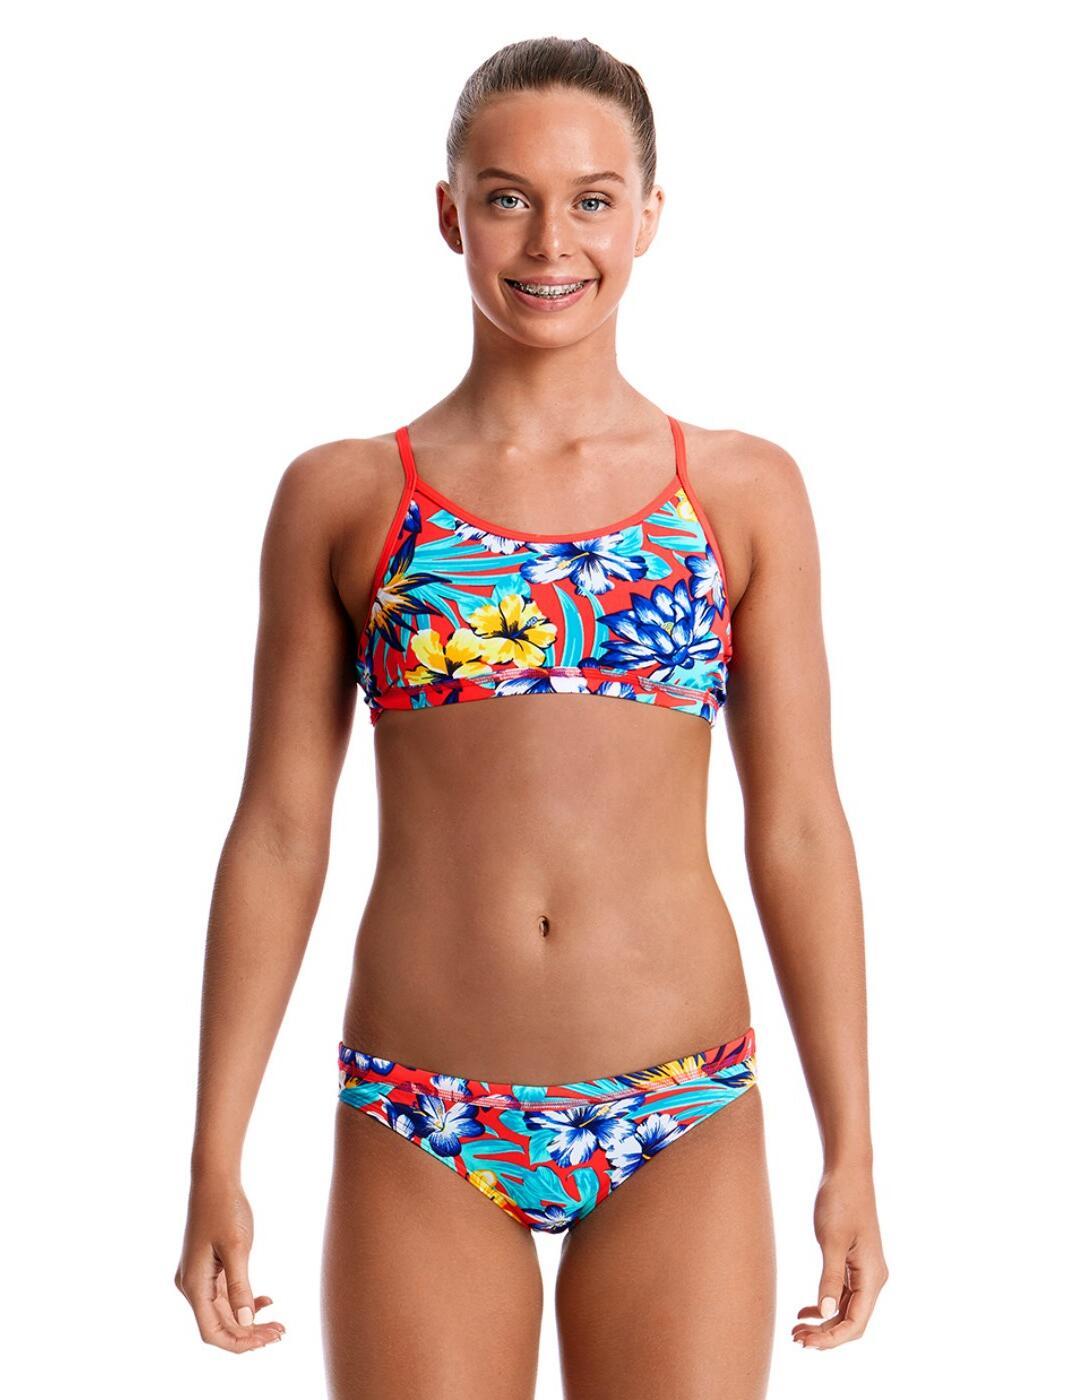 FS02G Funkita Girls Racerback Two Piece Bikini Set - FS02G02303 Aloha From Hawaii